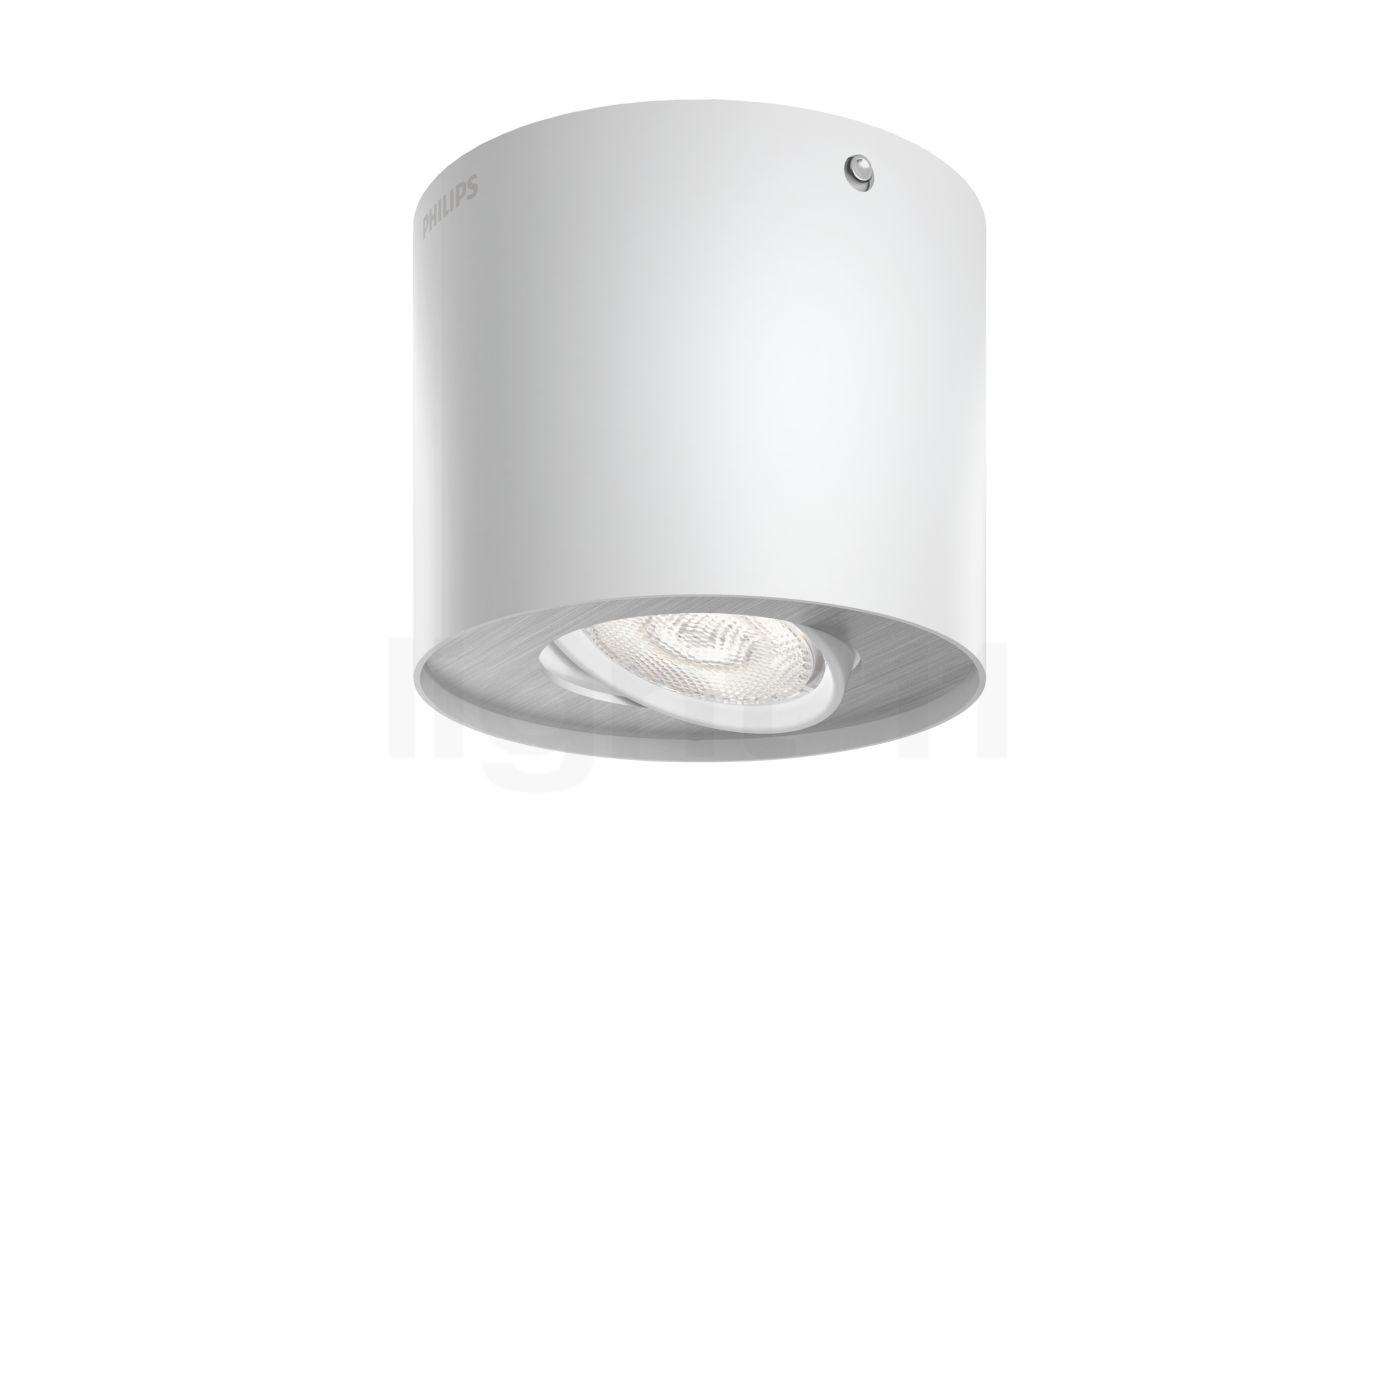 Philips Myliving Phase Ceiling Light Led 1 Lamp Ceiling Lights Regarding Philips Outdoor Ceiling Lights (#9 of 15)